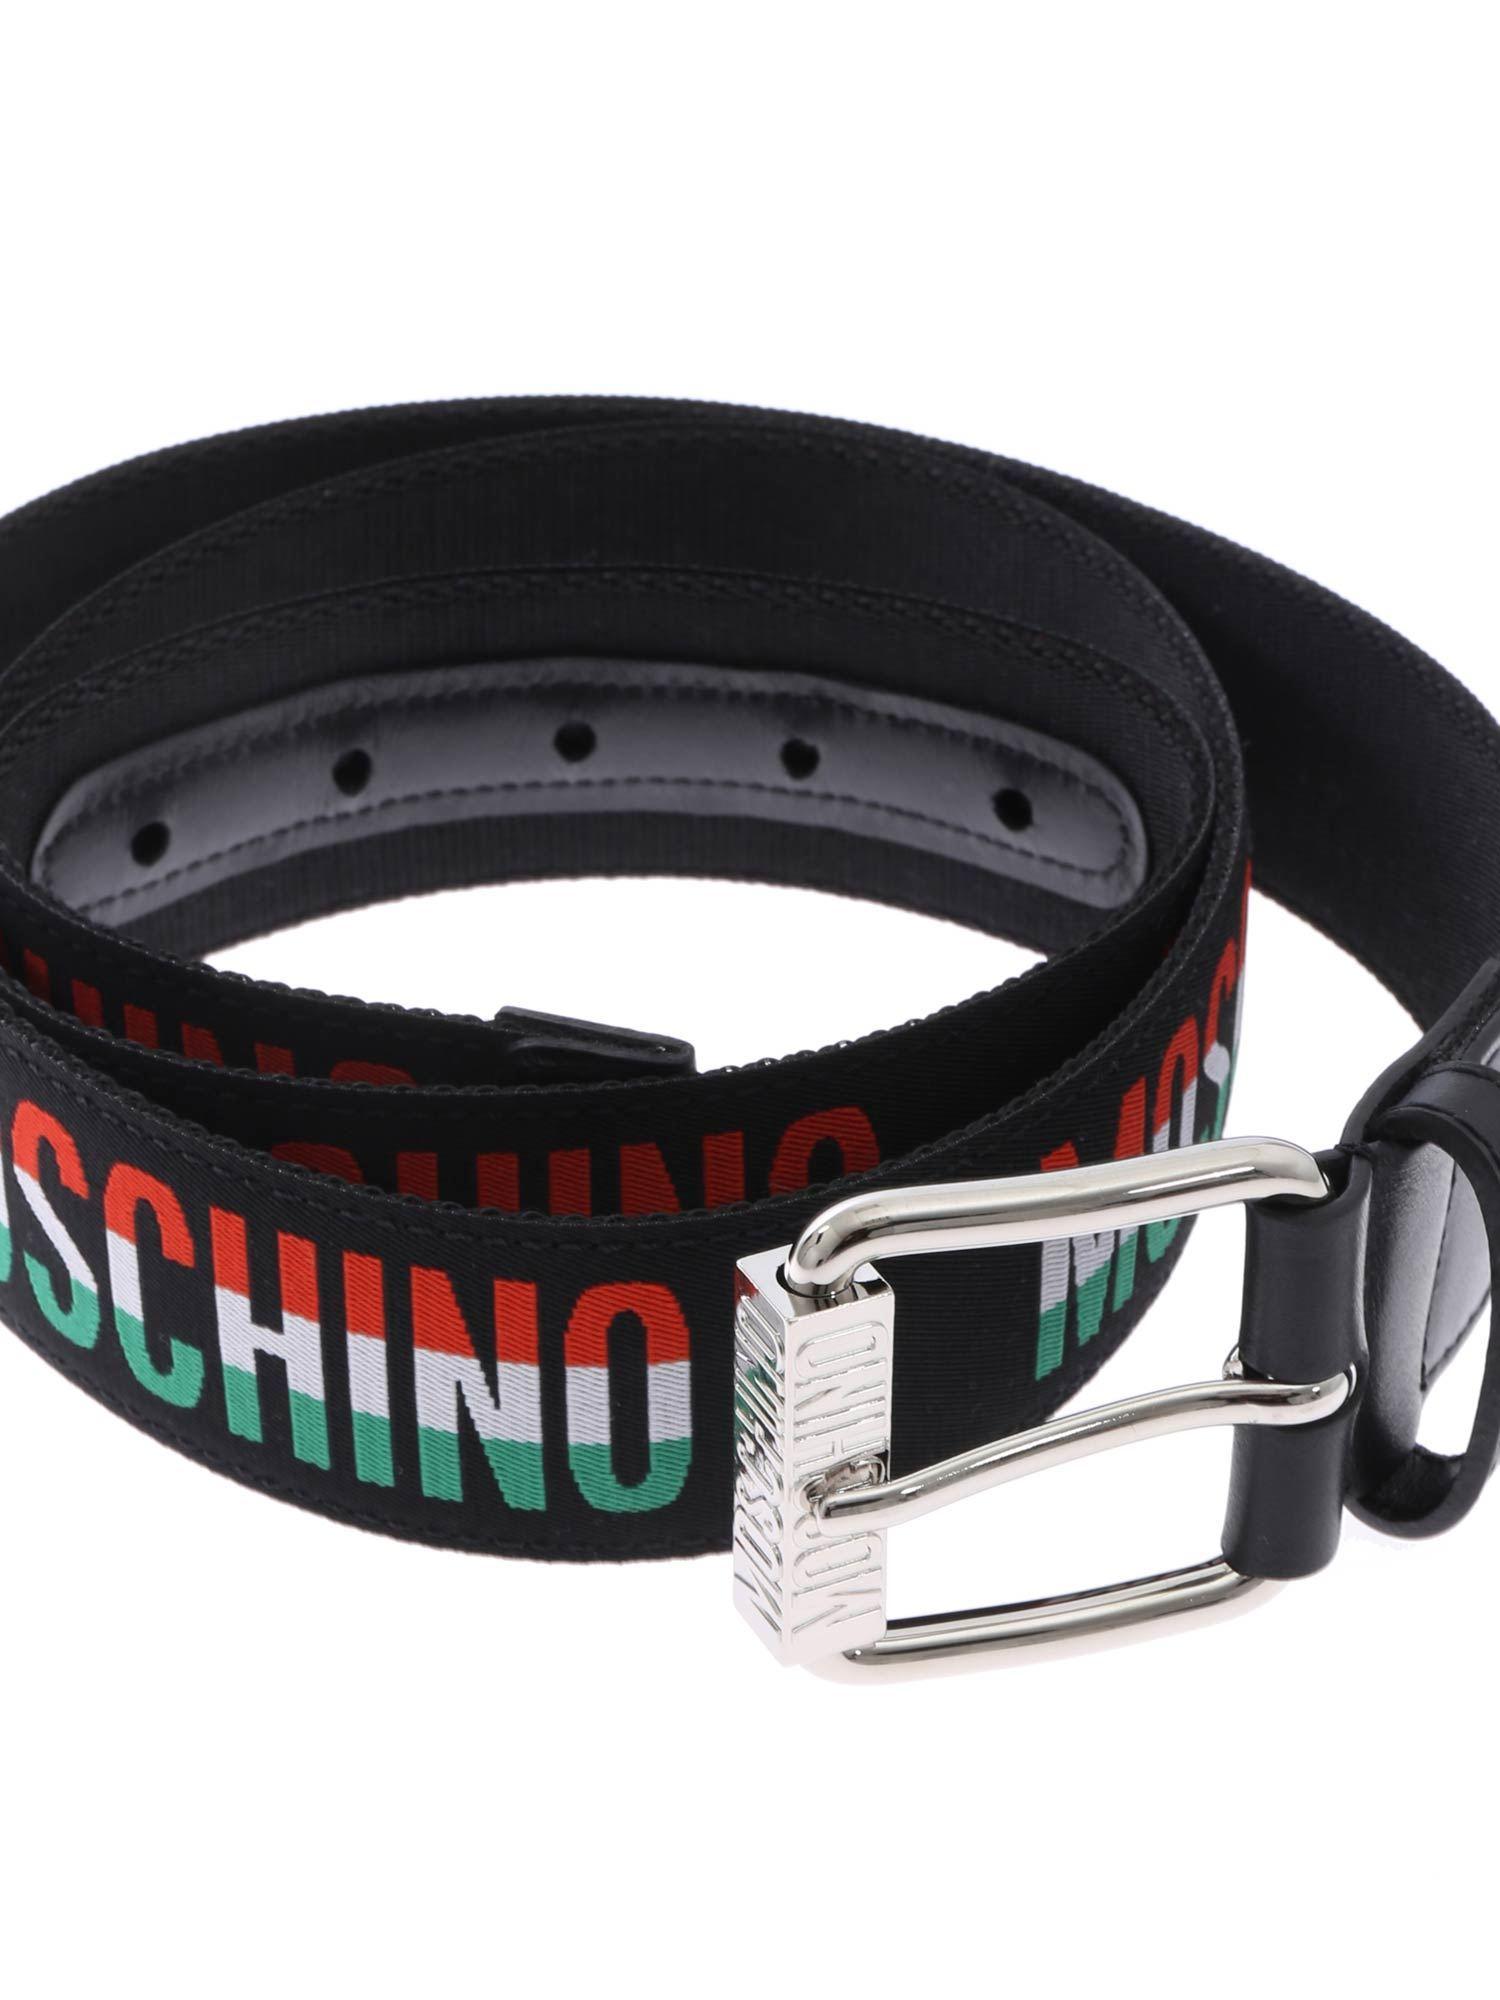 c6380d55cf Moschino Canvas Belt Italian Logo in Black for Men - Lyst